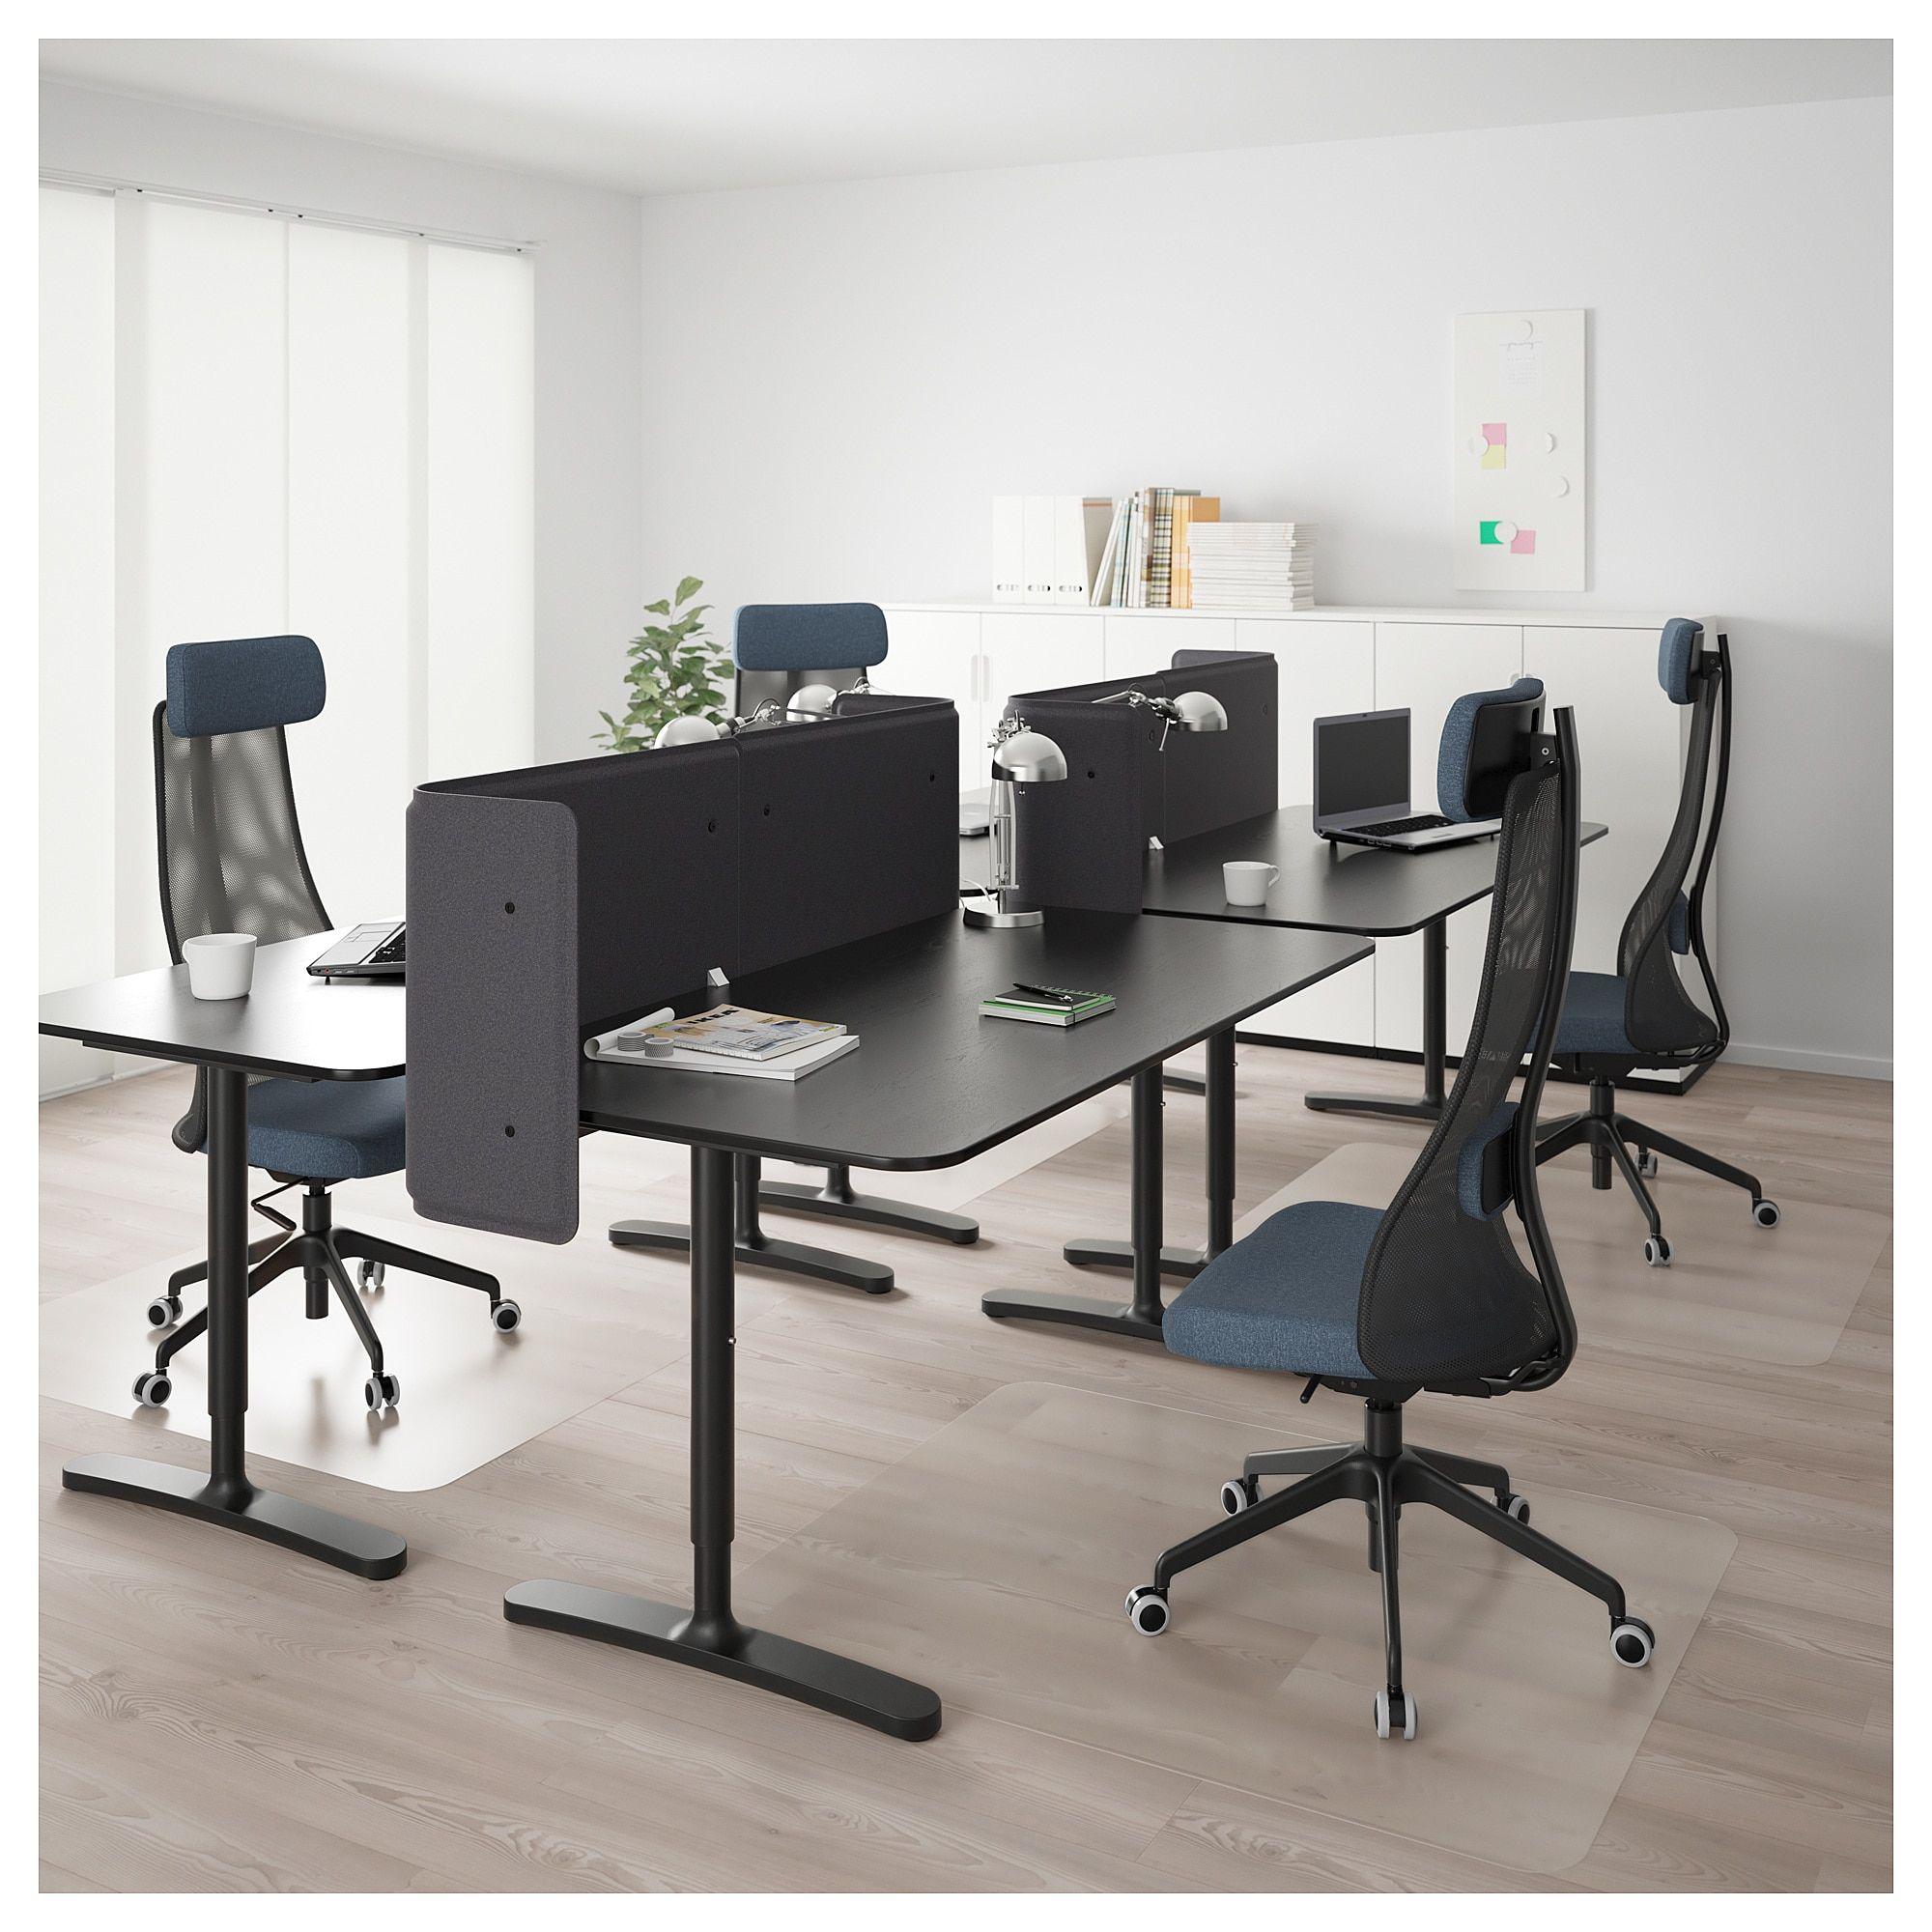 Bekant Desk With Screen Black Stained Ash Veneer Black Ikea Modern Office Interiors Office Interior Design Ikea Bekant Desk